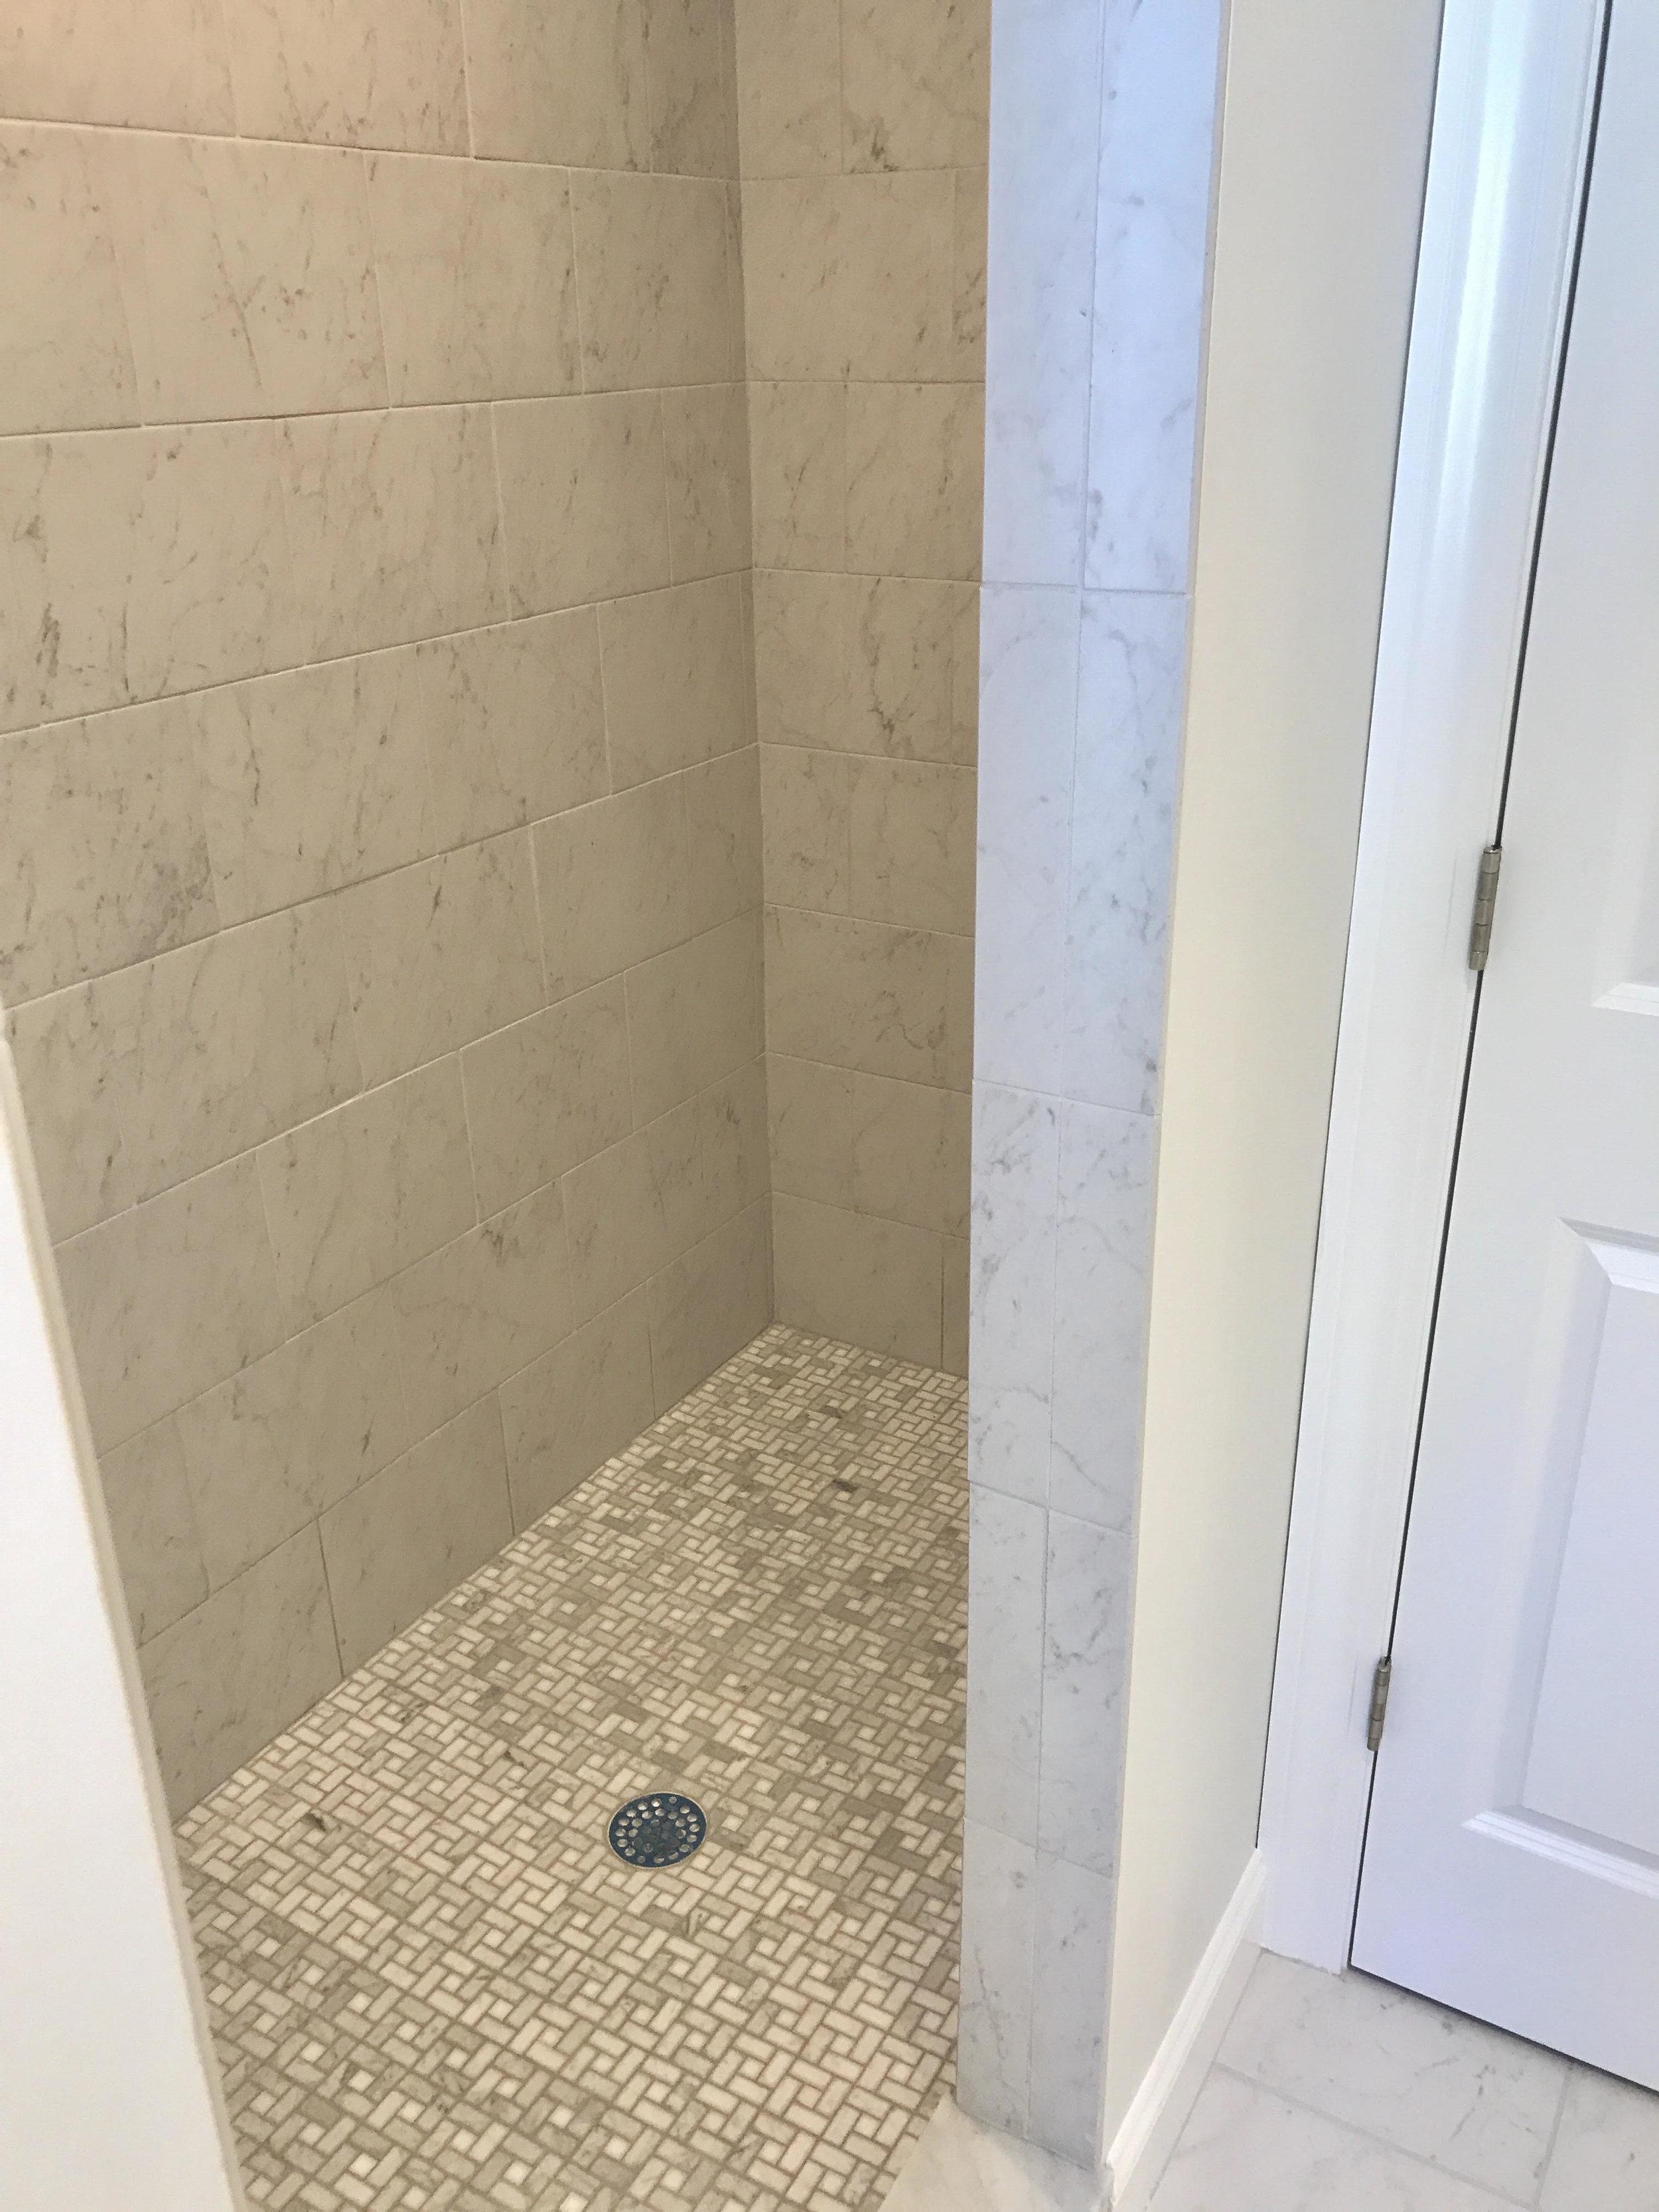 35 laurel master shower 9-5-18.jpg